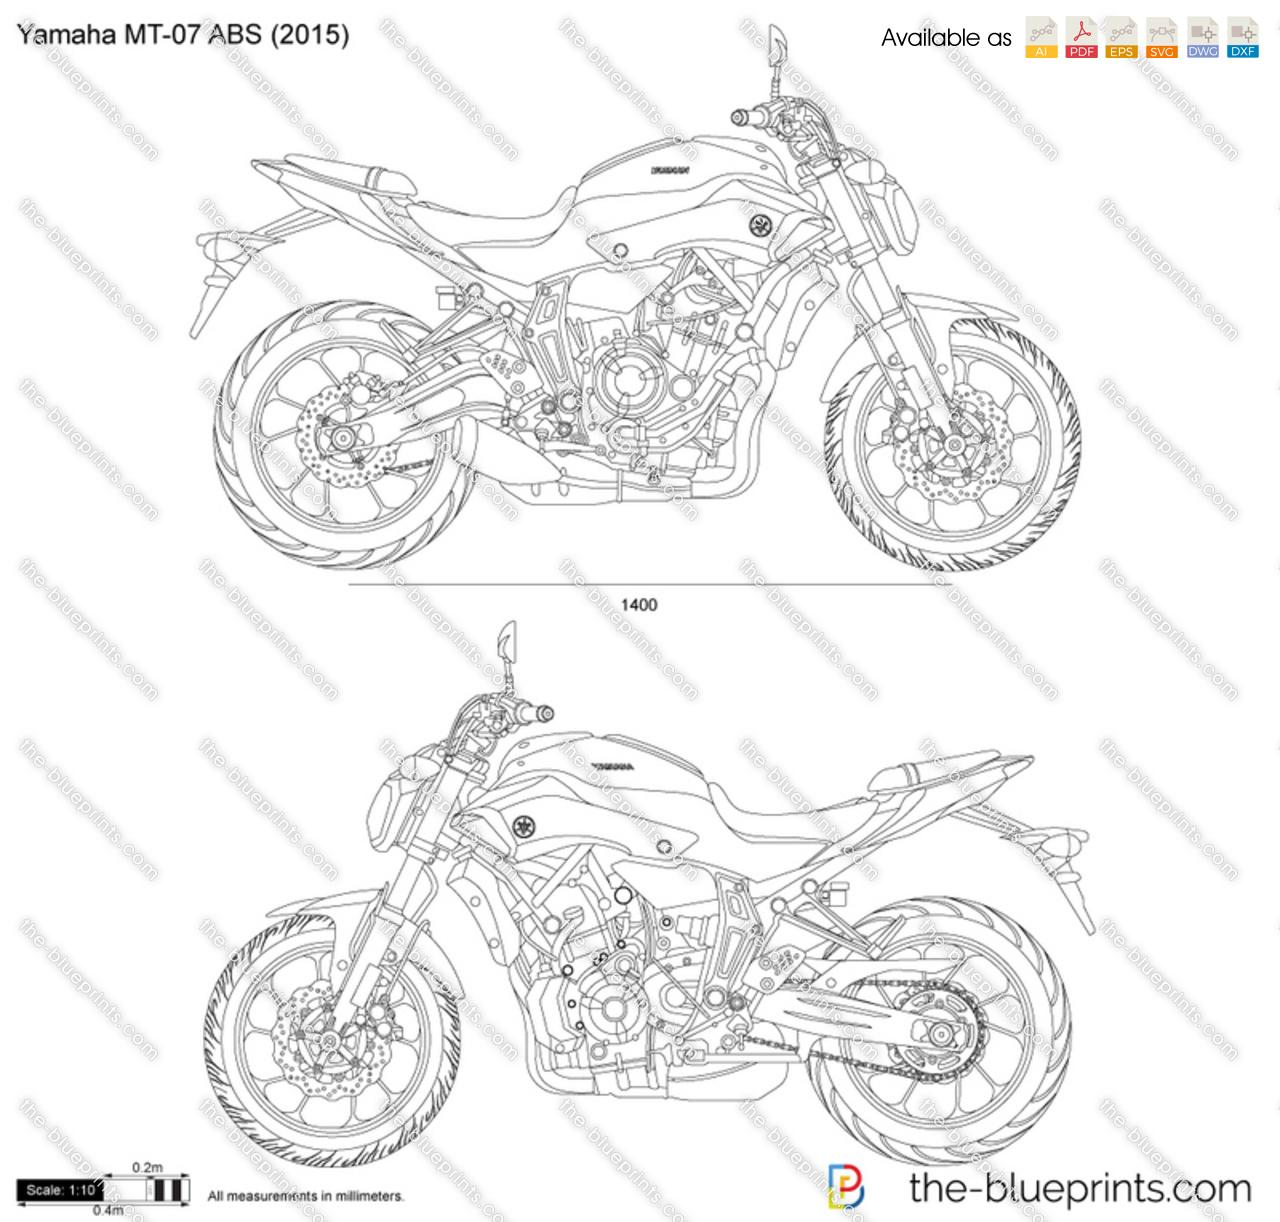 Yamaha MT-07 ABS vector drawing